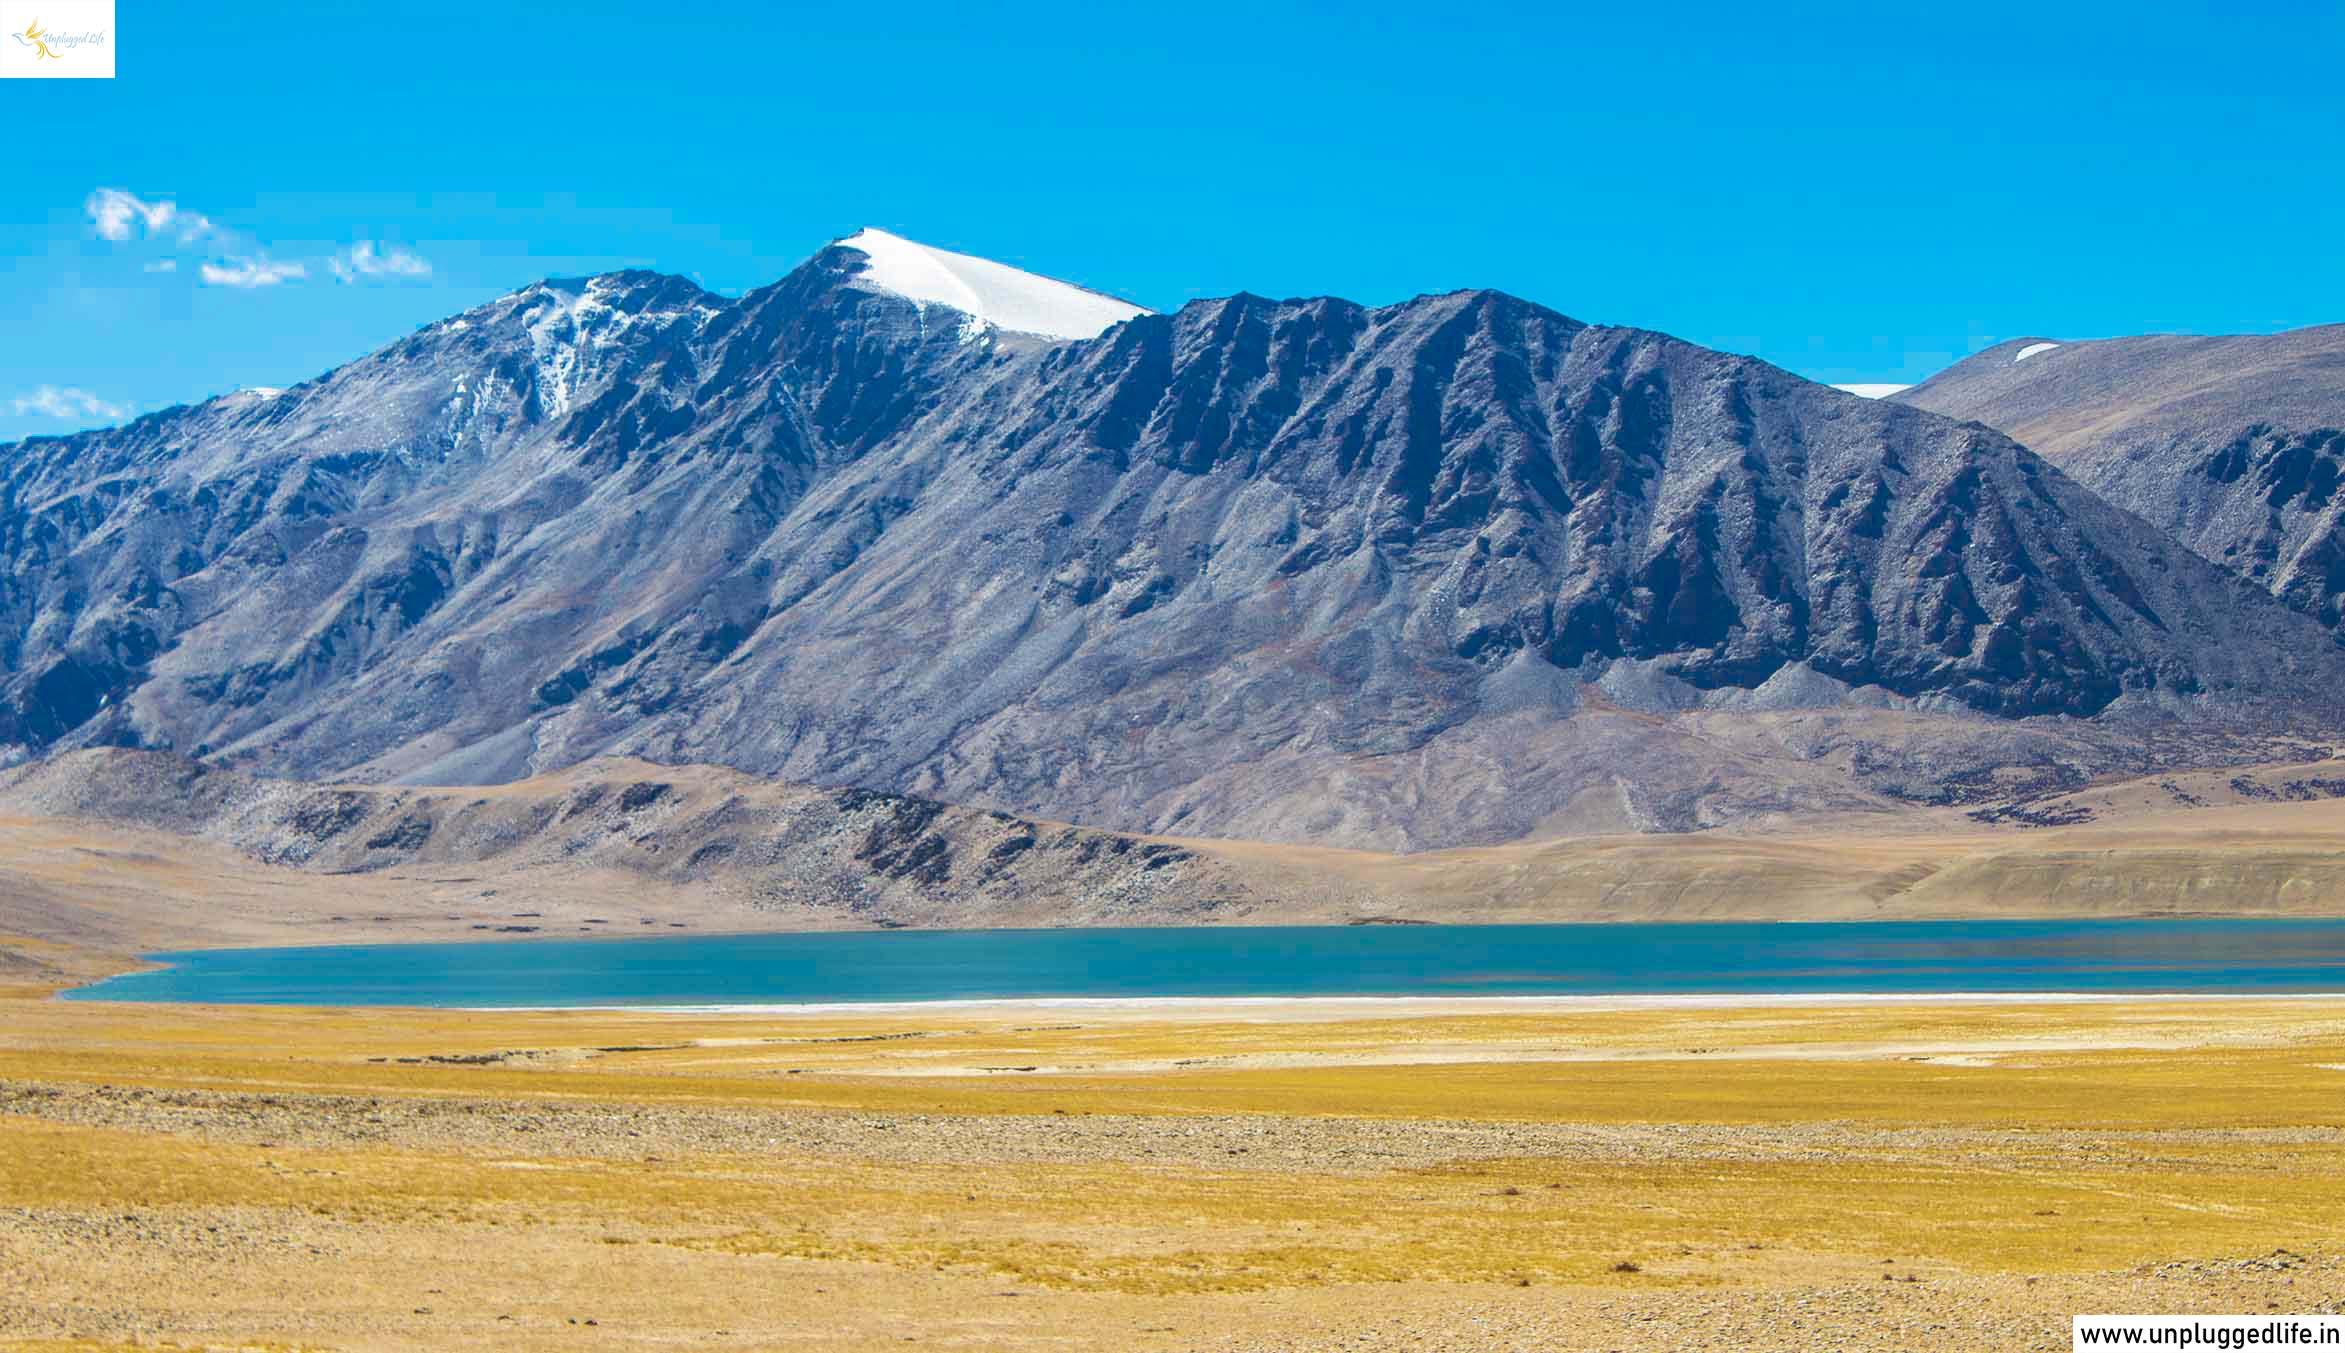 Unplugged Life, Himalayas, Ladakh, Leh View, View of Ladakh, Mountain View, Leh Ladakh Sightseeing Tour, Leh Ladakh Package, Book Ladakh Trip, Top Places in Ladakh, Sightseeing in Leh-Ladakh, Ladakh View, Leh Ladakh View, Landscape in Ladakh, Kyagar Tso